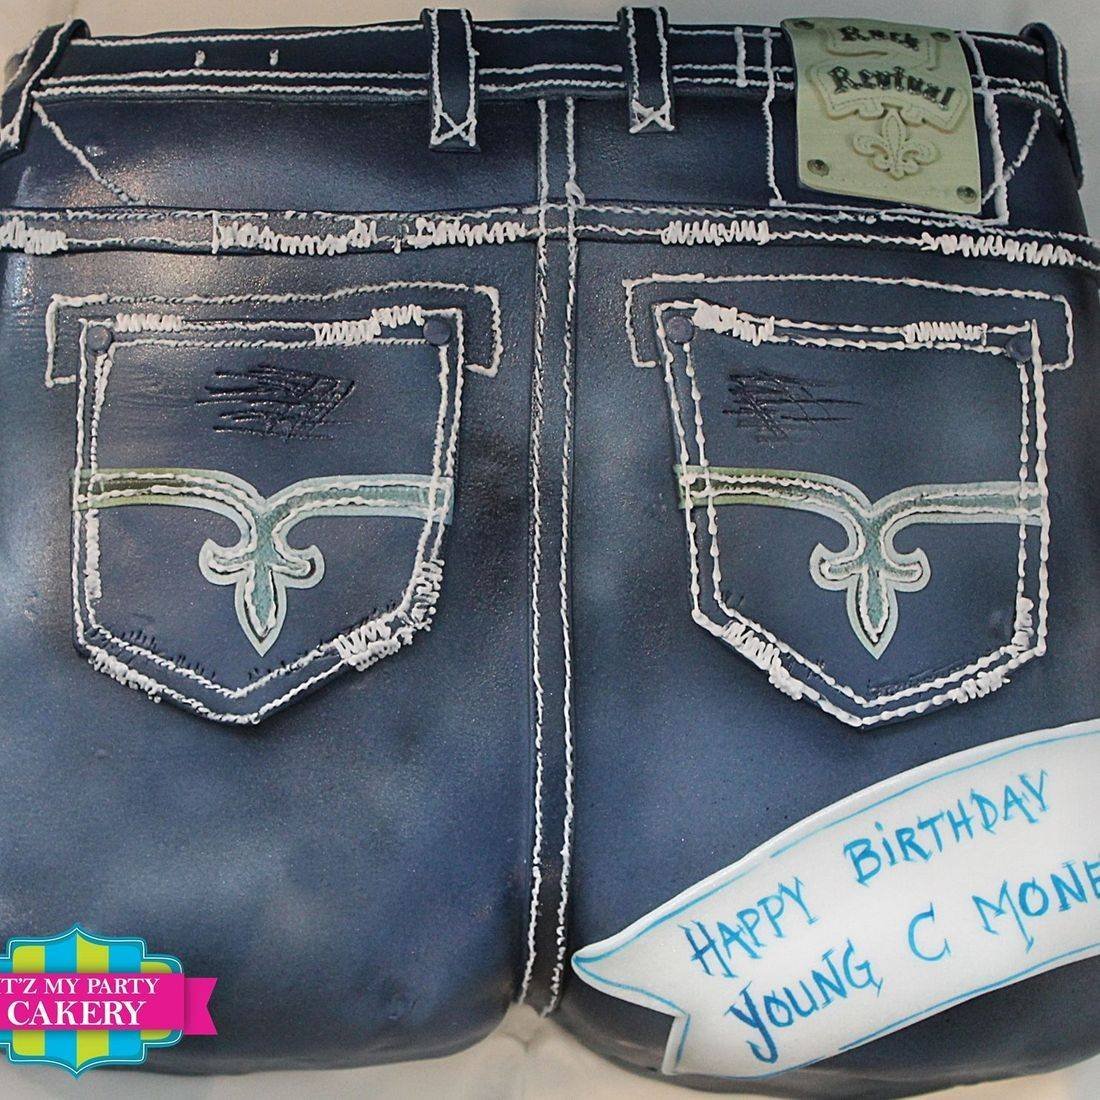 True Religion Jeans Carved Dimensional Cake Milwaukee